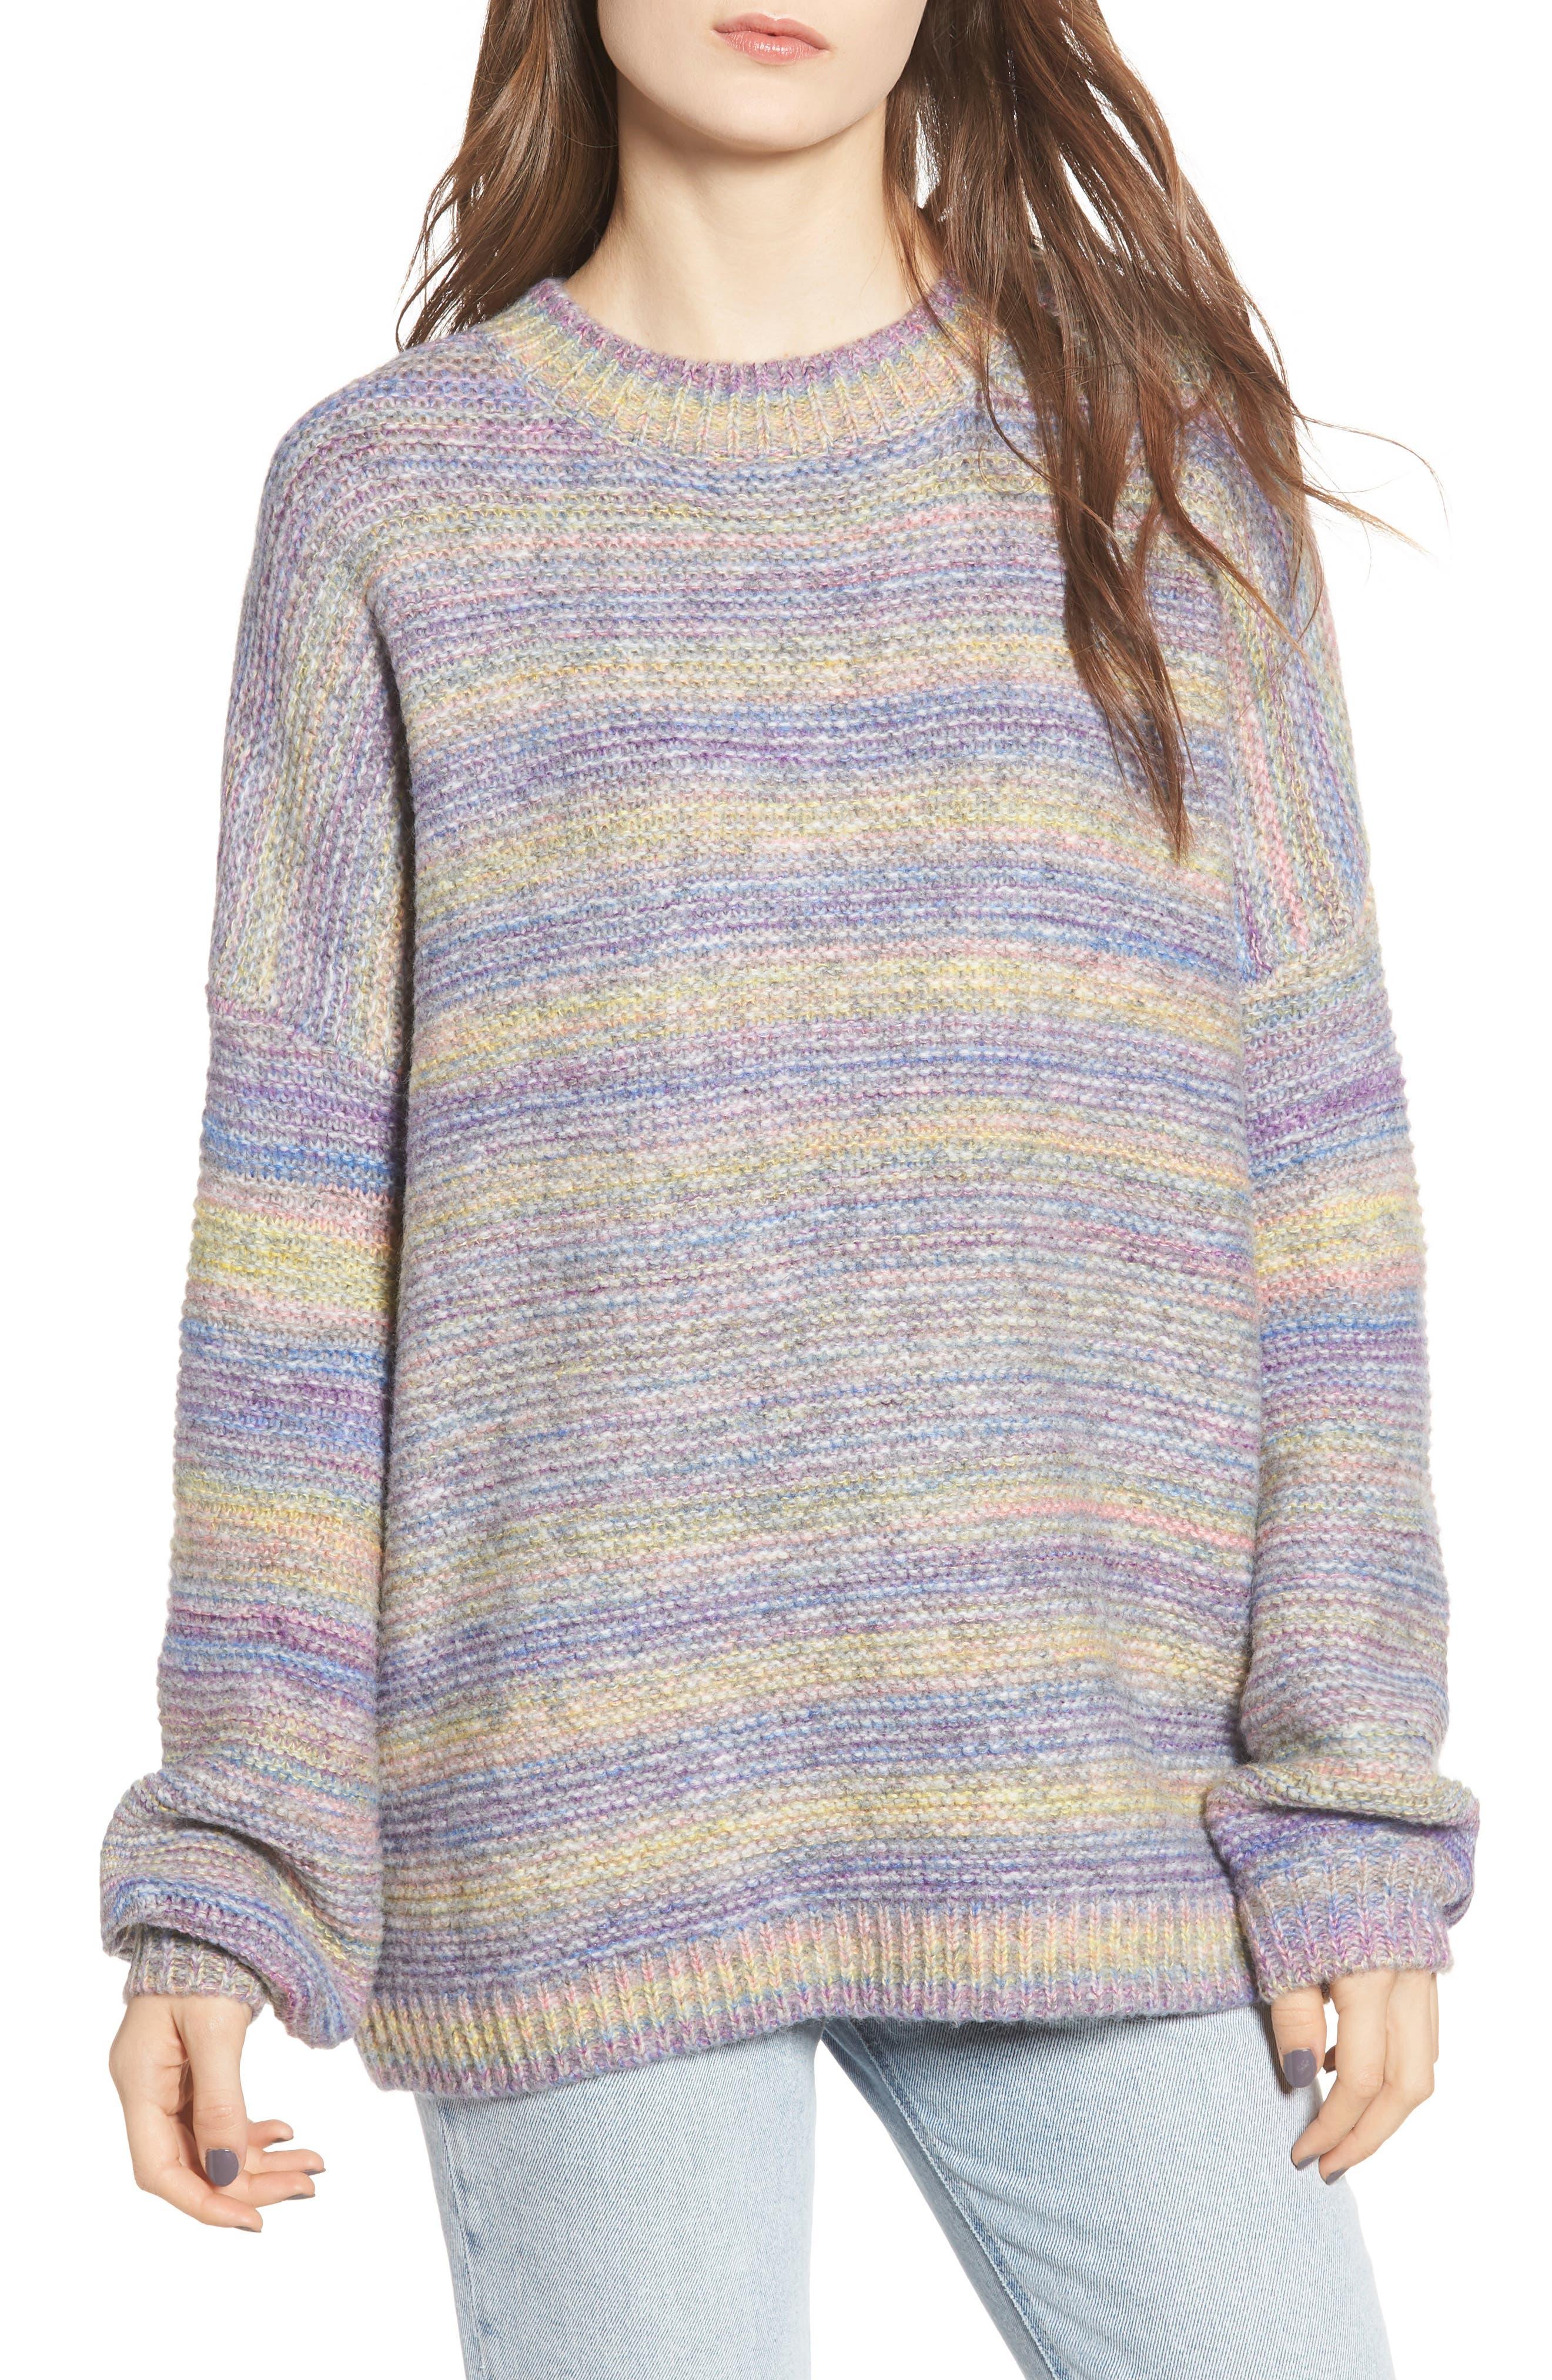 PROSPERITY DENIM, Rainbow Marl Sweater, Main thumbnail 1, color, YELLOW